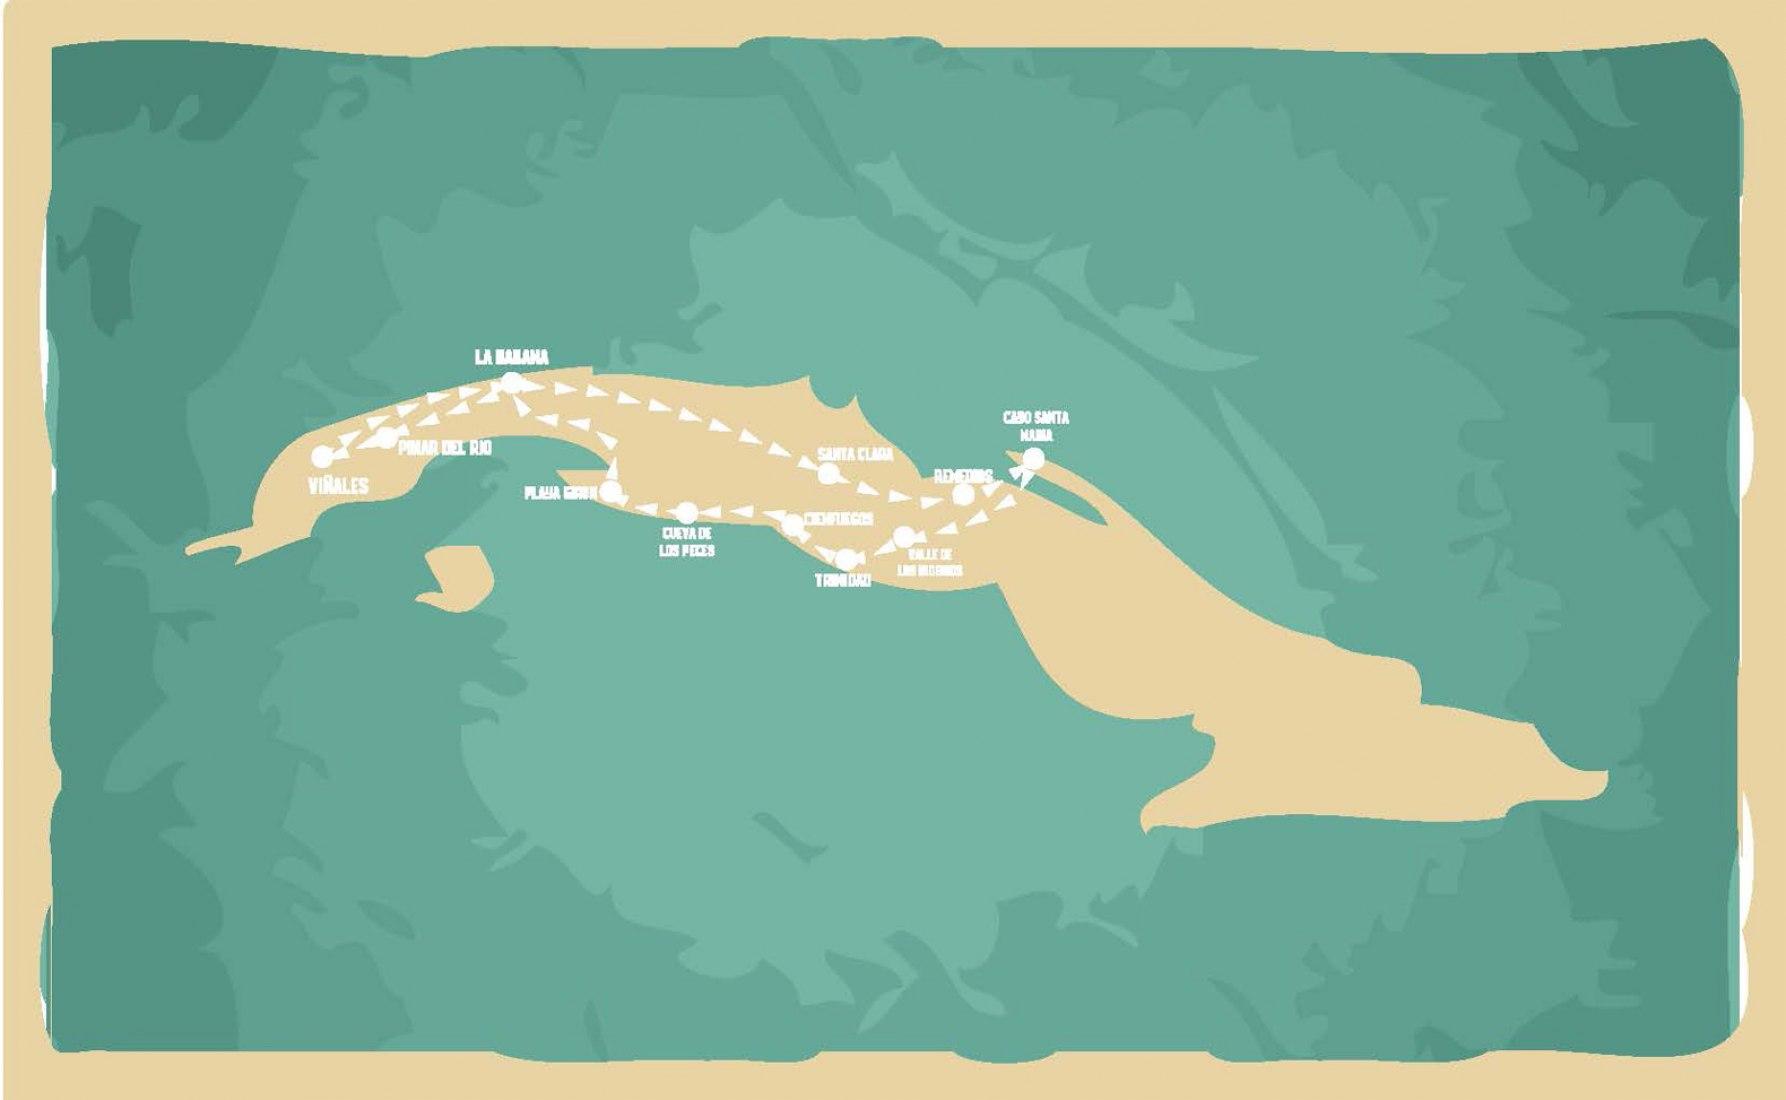 El viaje a Cuba de Felipe Pich. Mapa de Cuba con la trayectoria realizada. Imagen © Felipe Pitch.